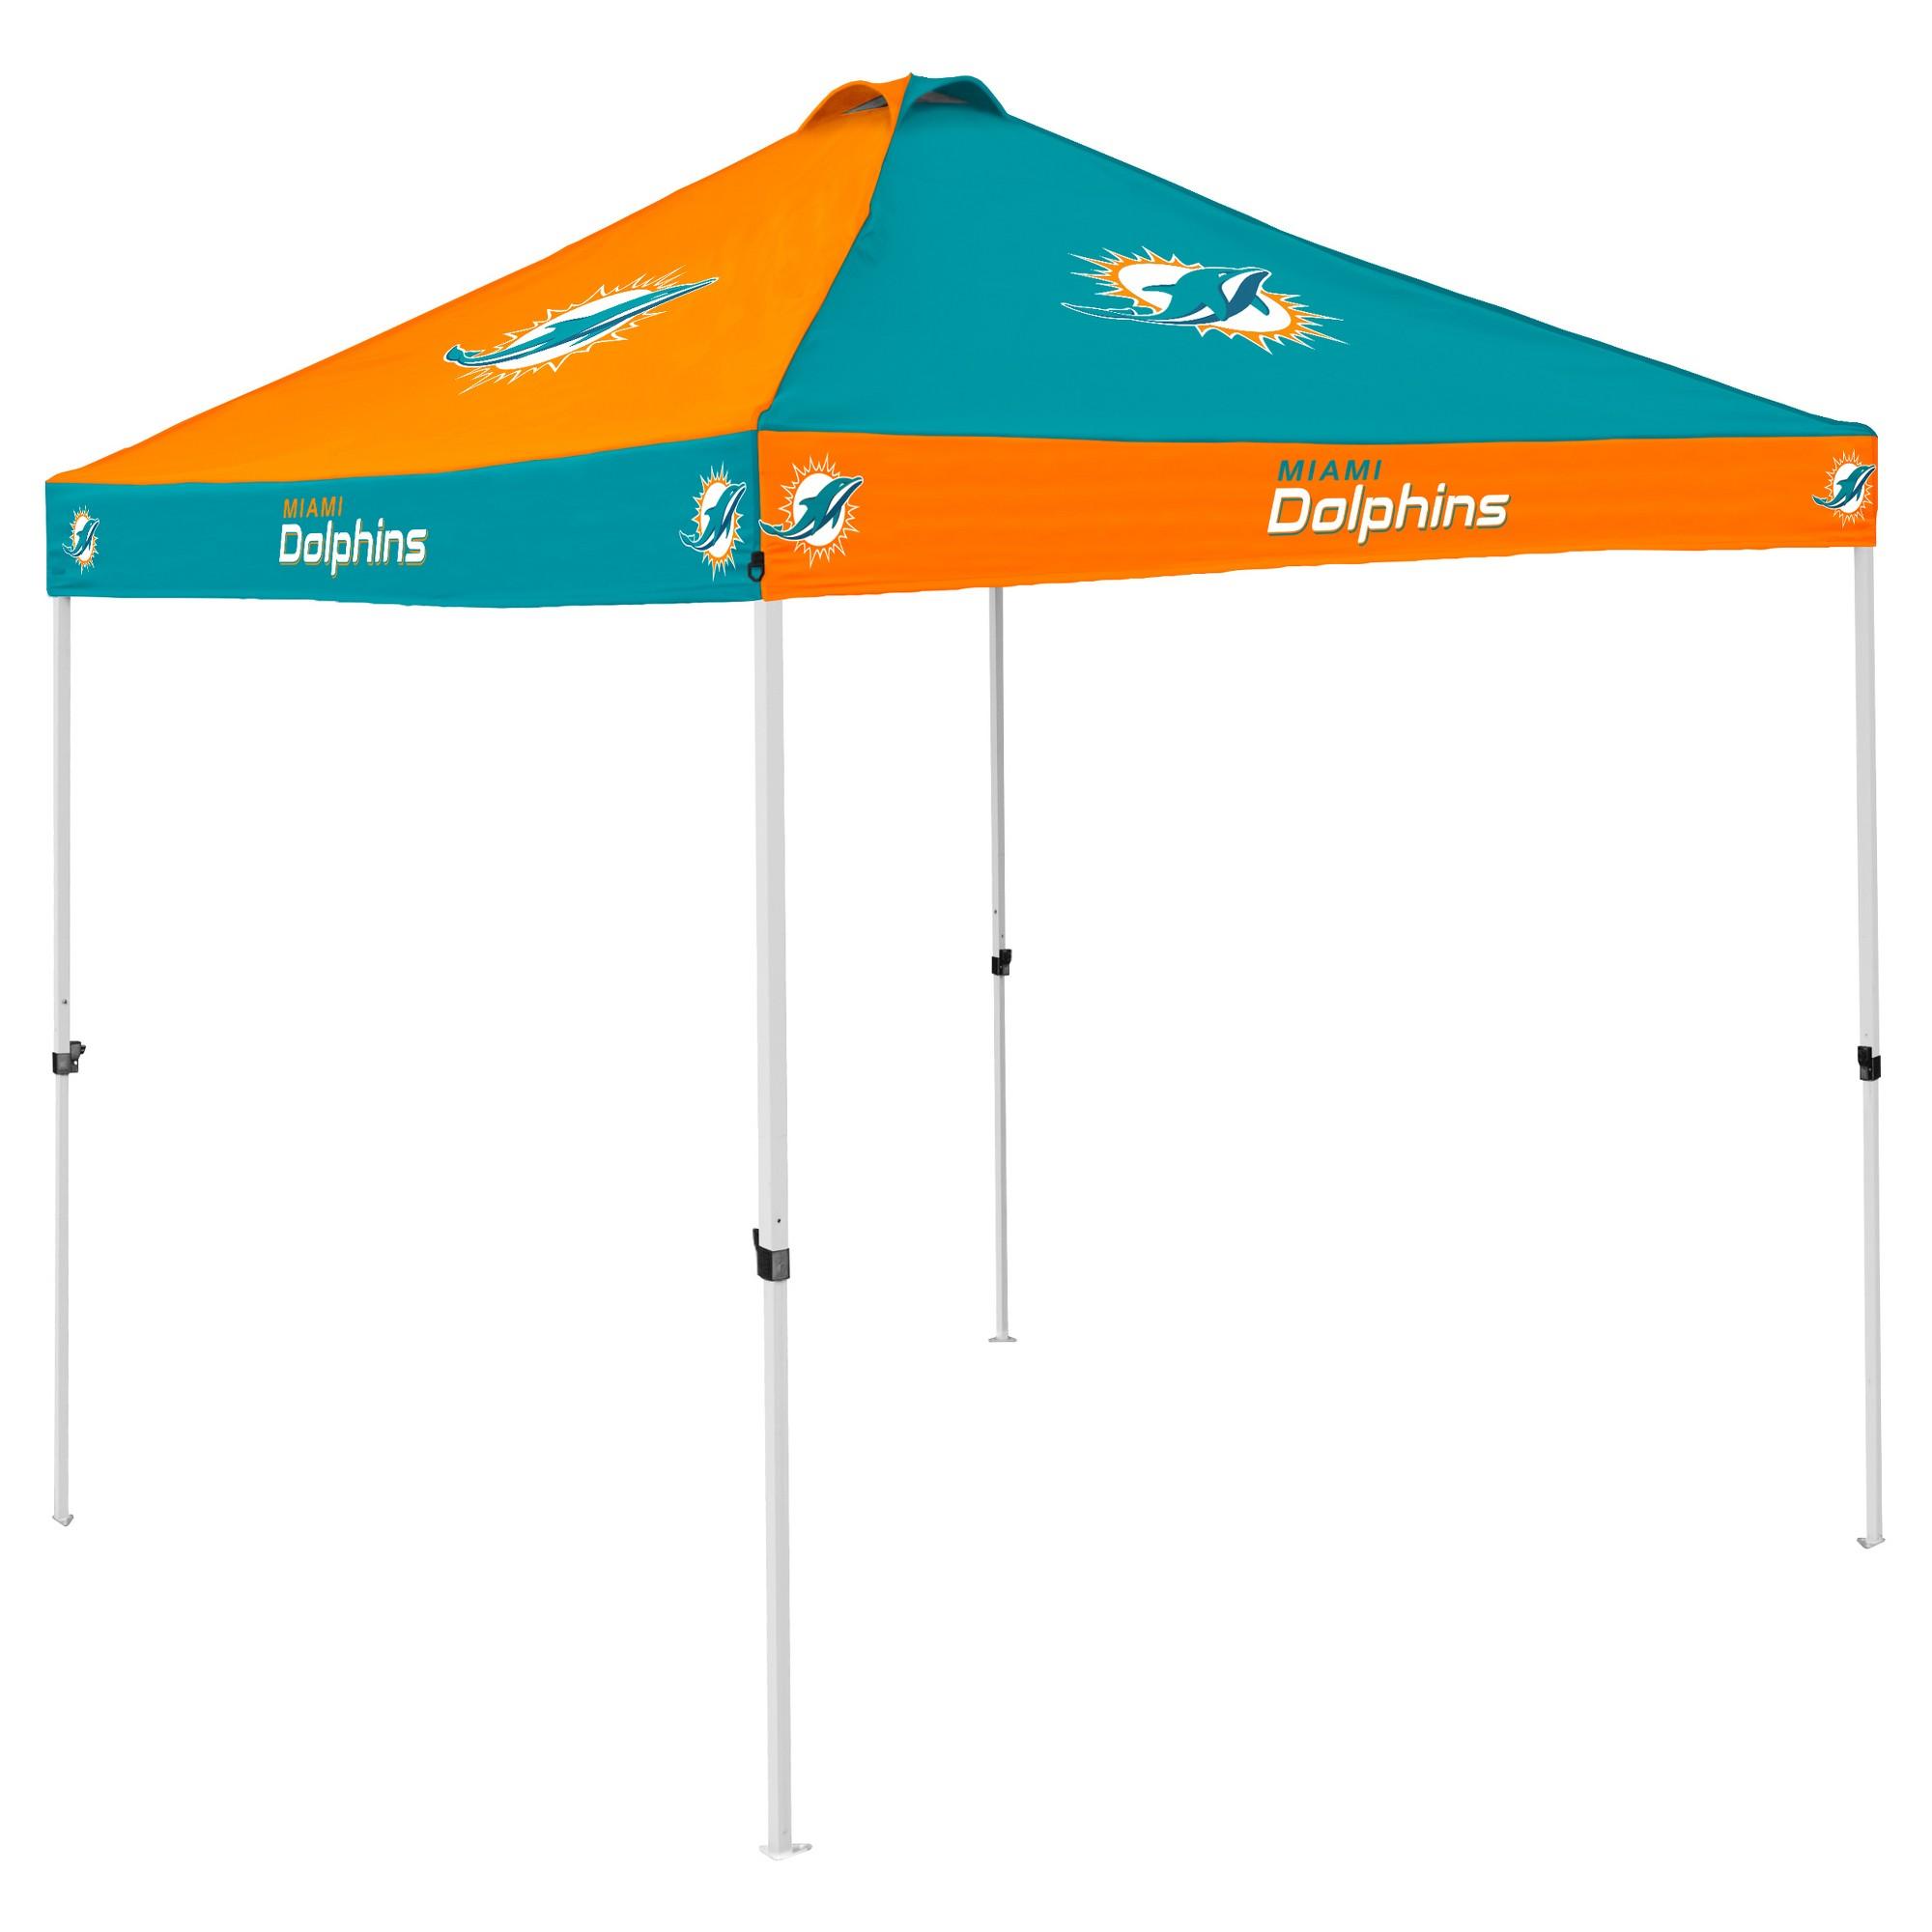 NFL Miami Dolphins 9x9u0027 Checkerboard Canopy Tent  sc 1 st  Pinterest & NFL Miami Dolphins 9x9u0027 Checkerboard Canopy Tent | Nfl miami ...